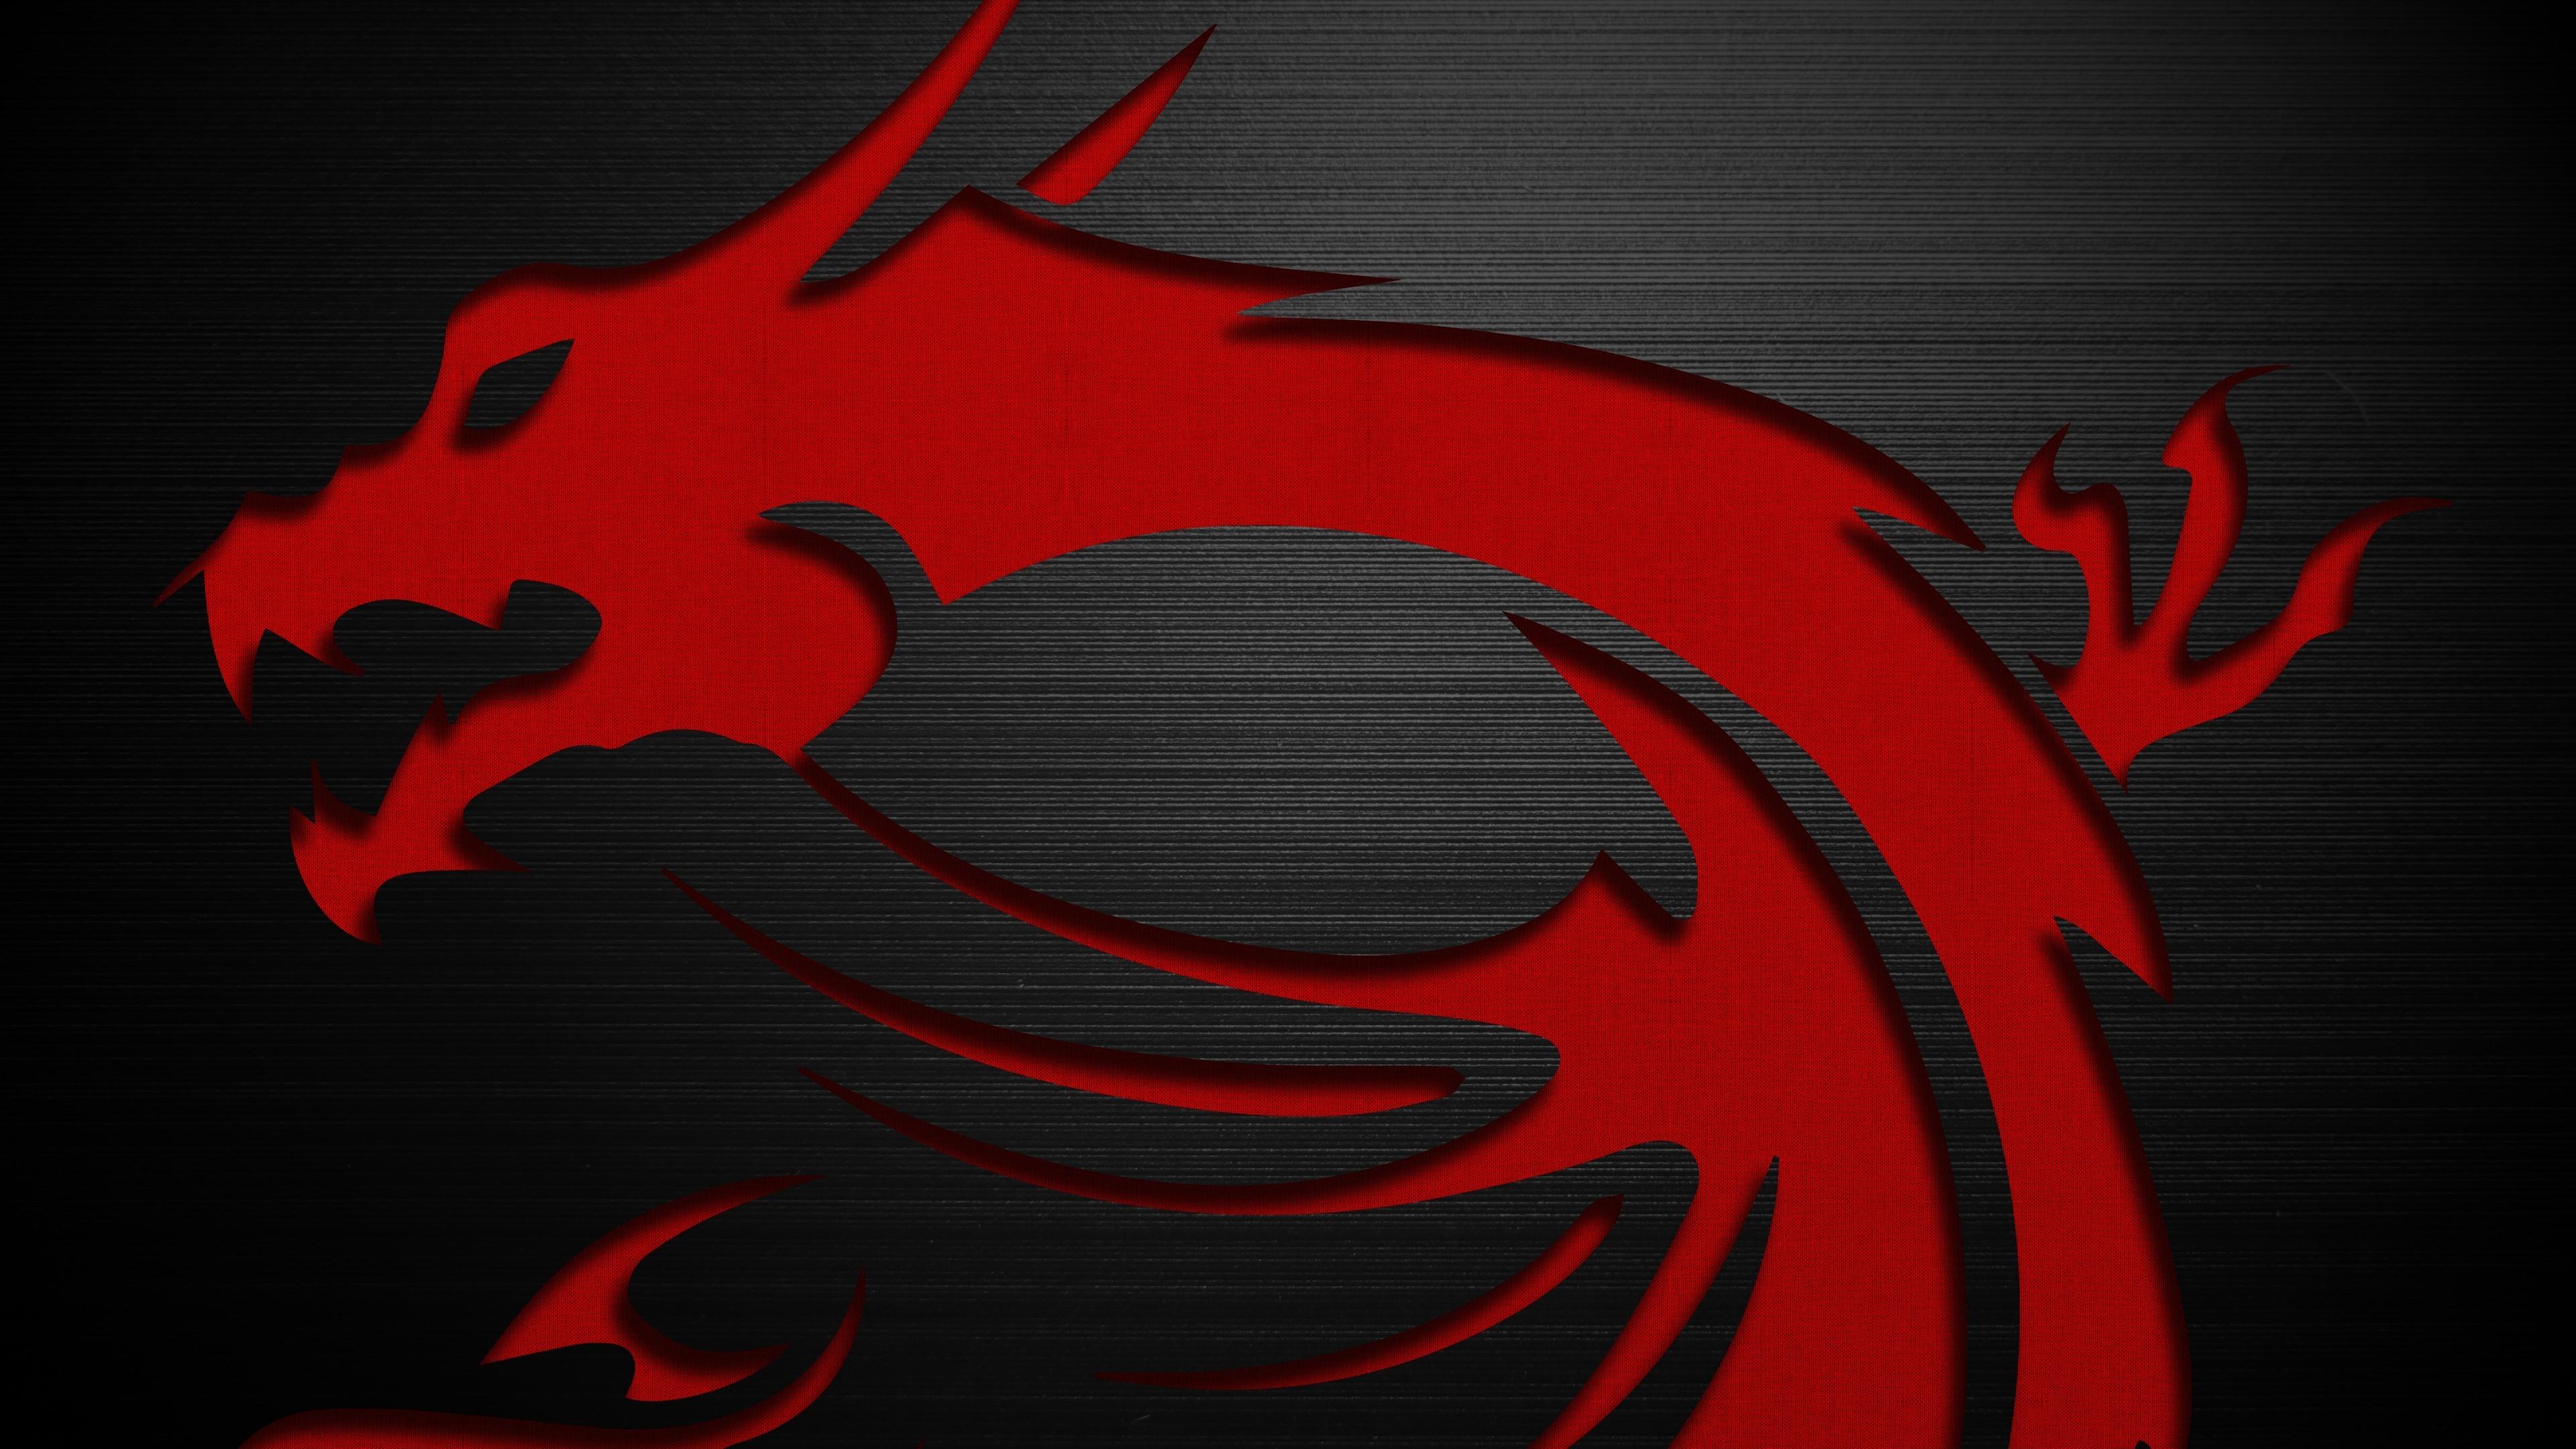 Dragon logo wallpaper 71 pictures - Msi logo wallpaper ...